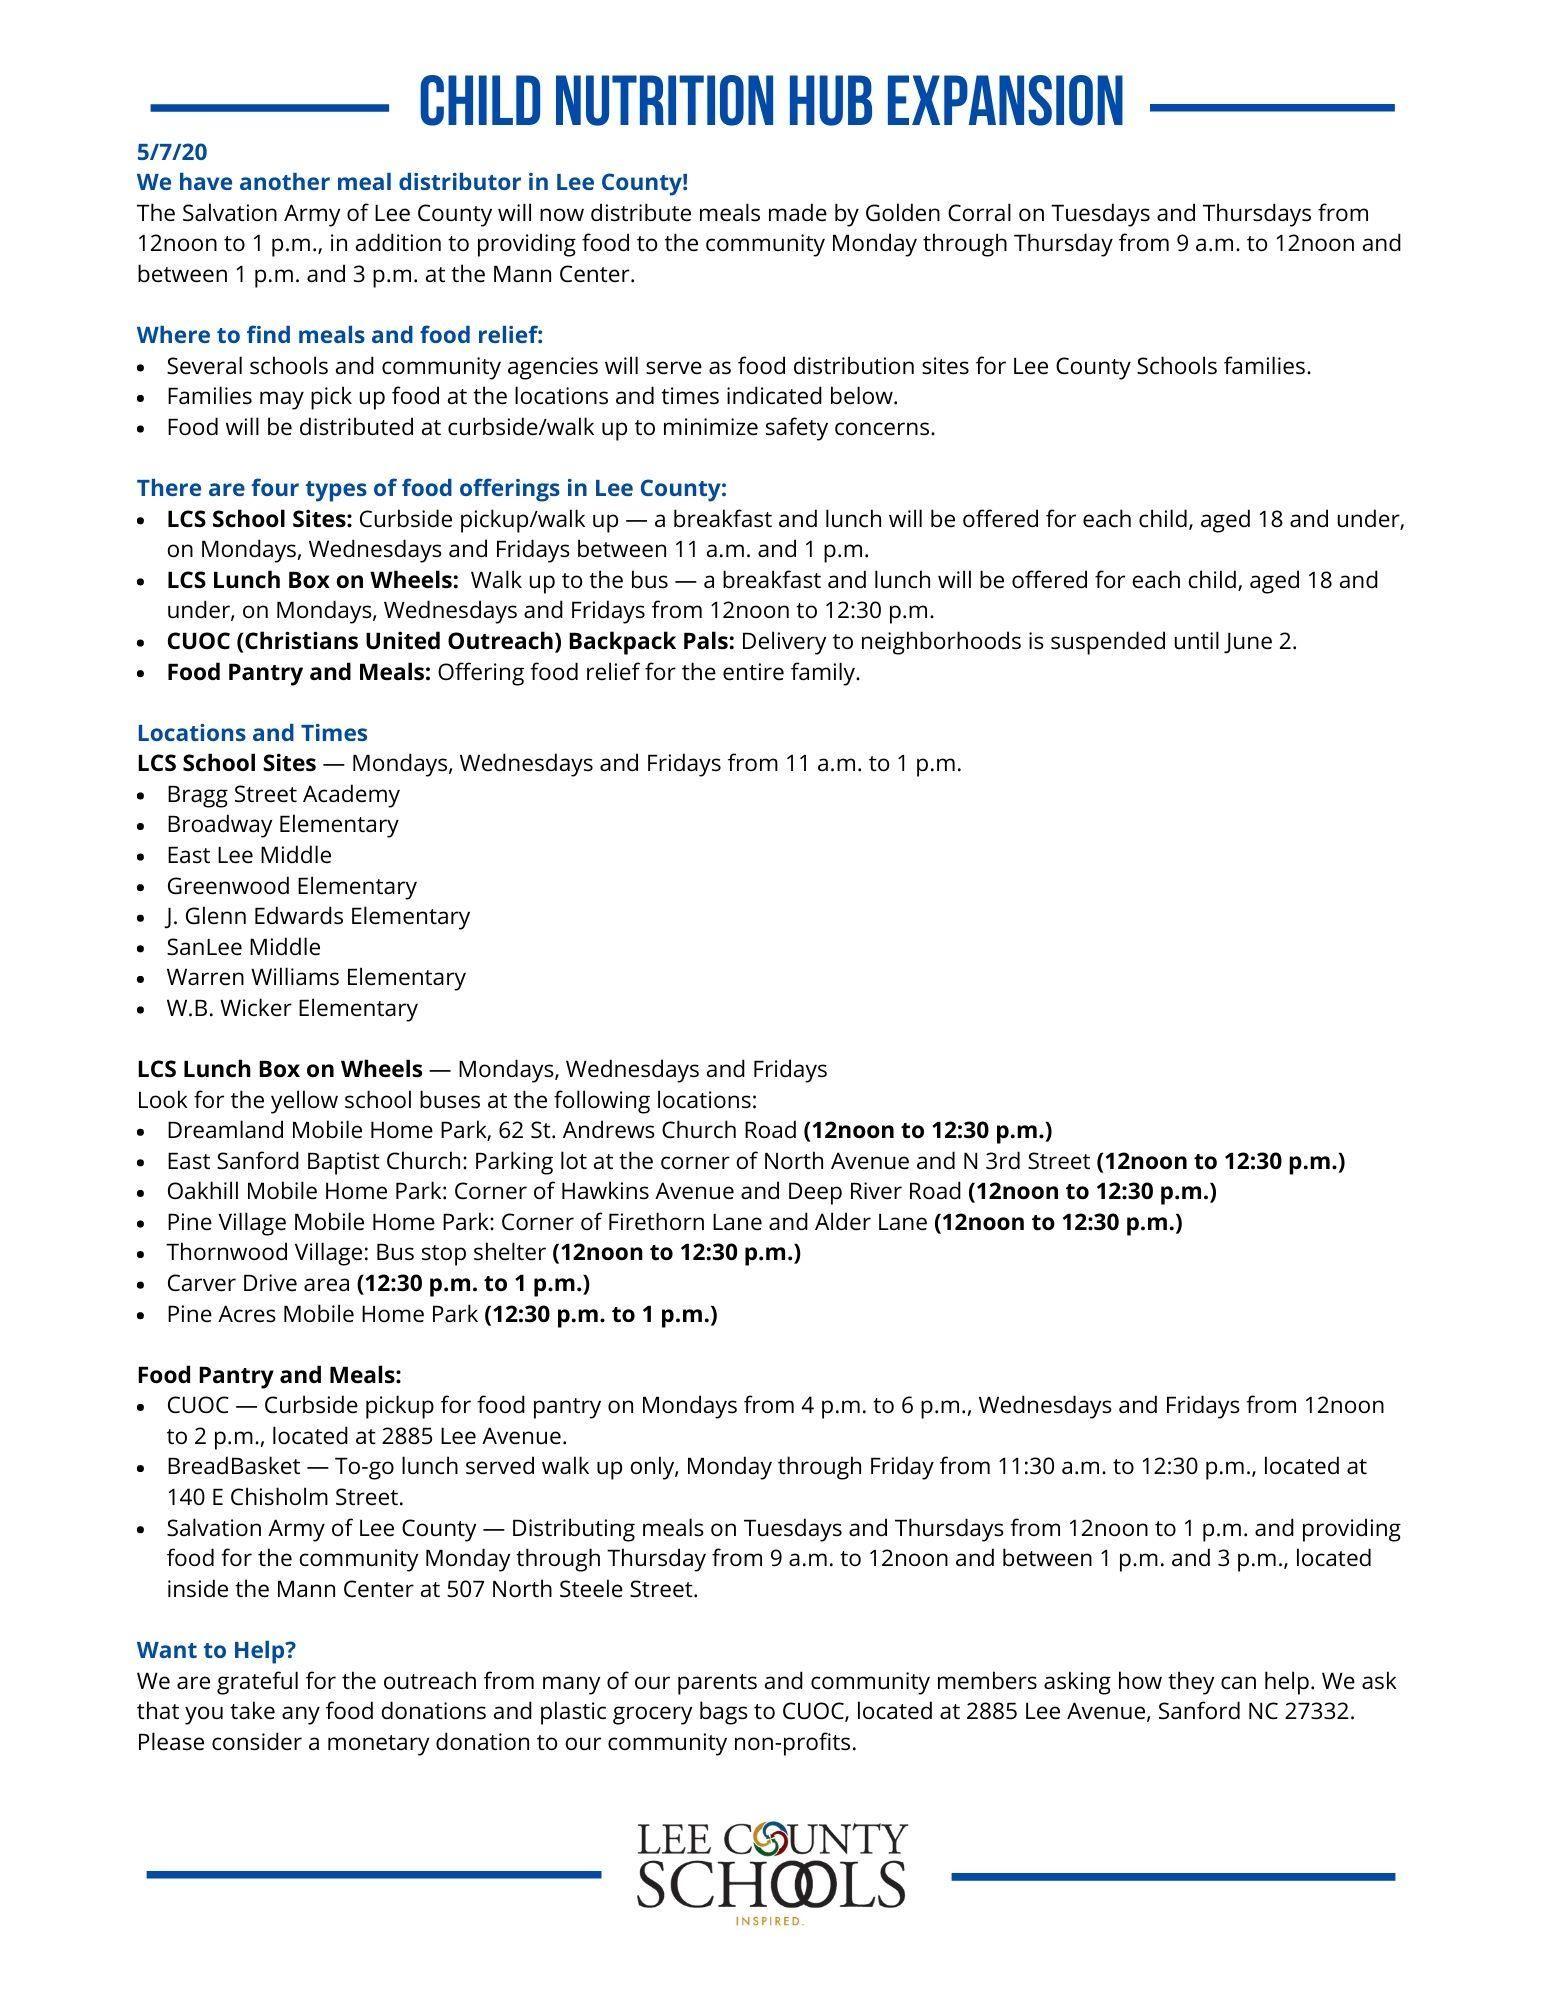 Child Nutrition Hub Information